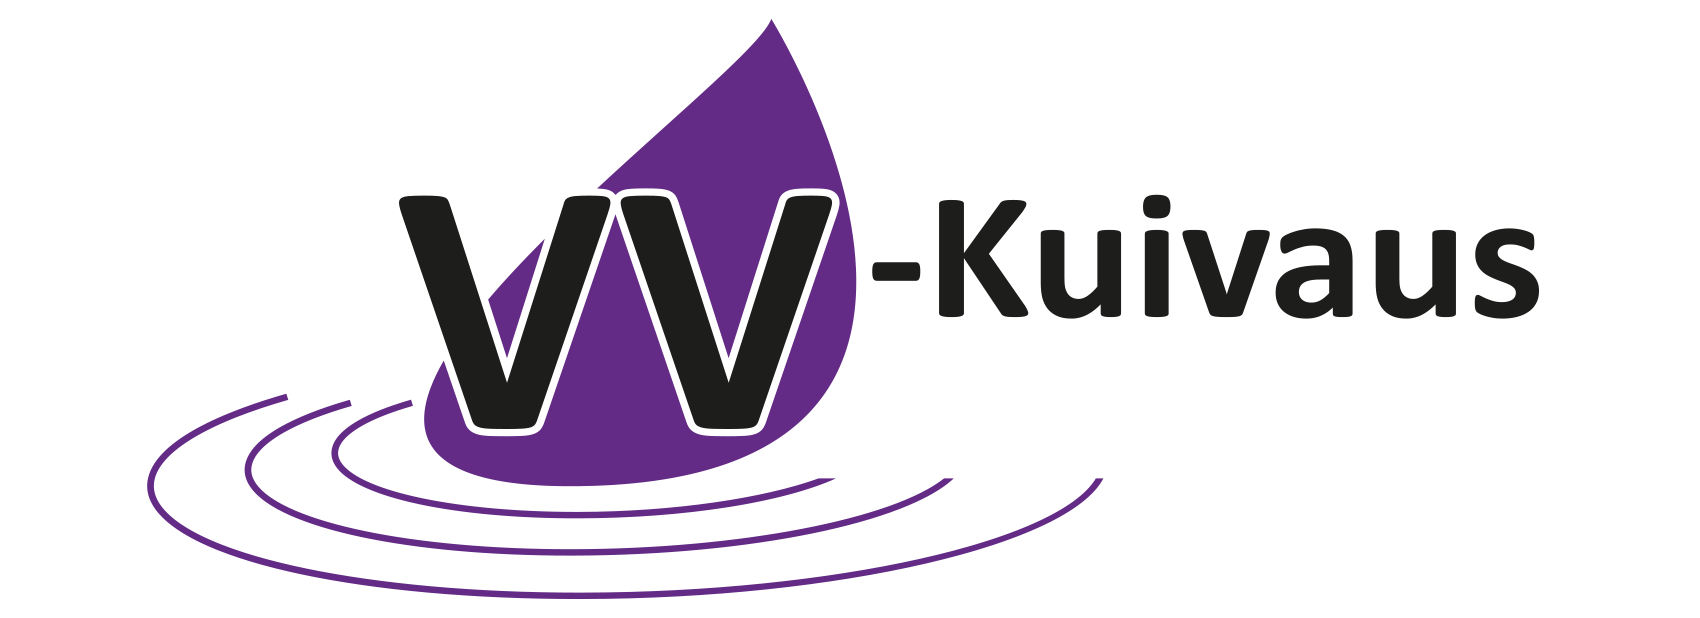 VV-kuivaus logo